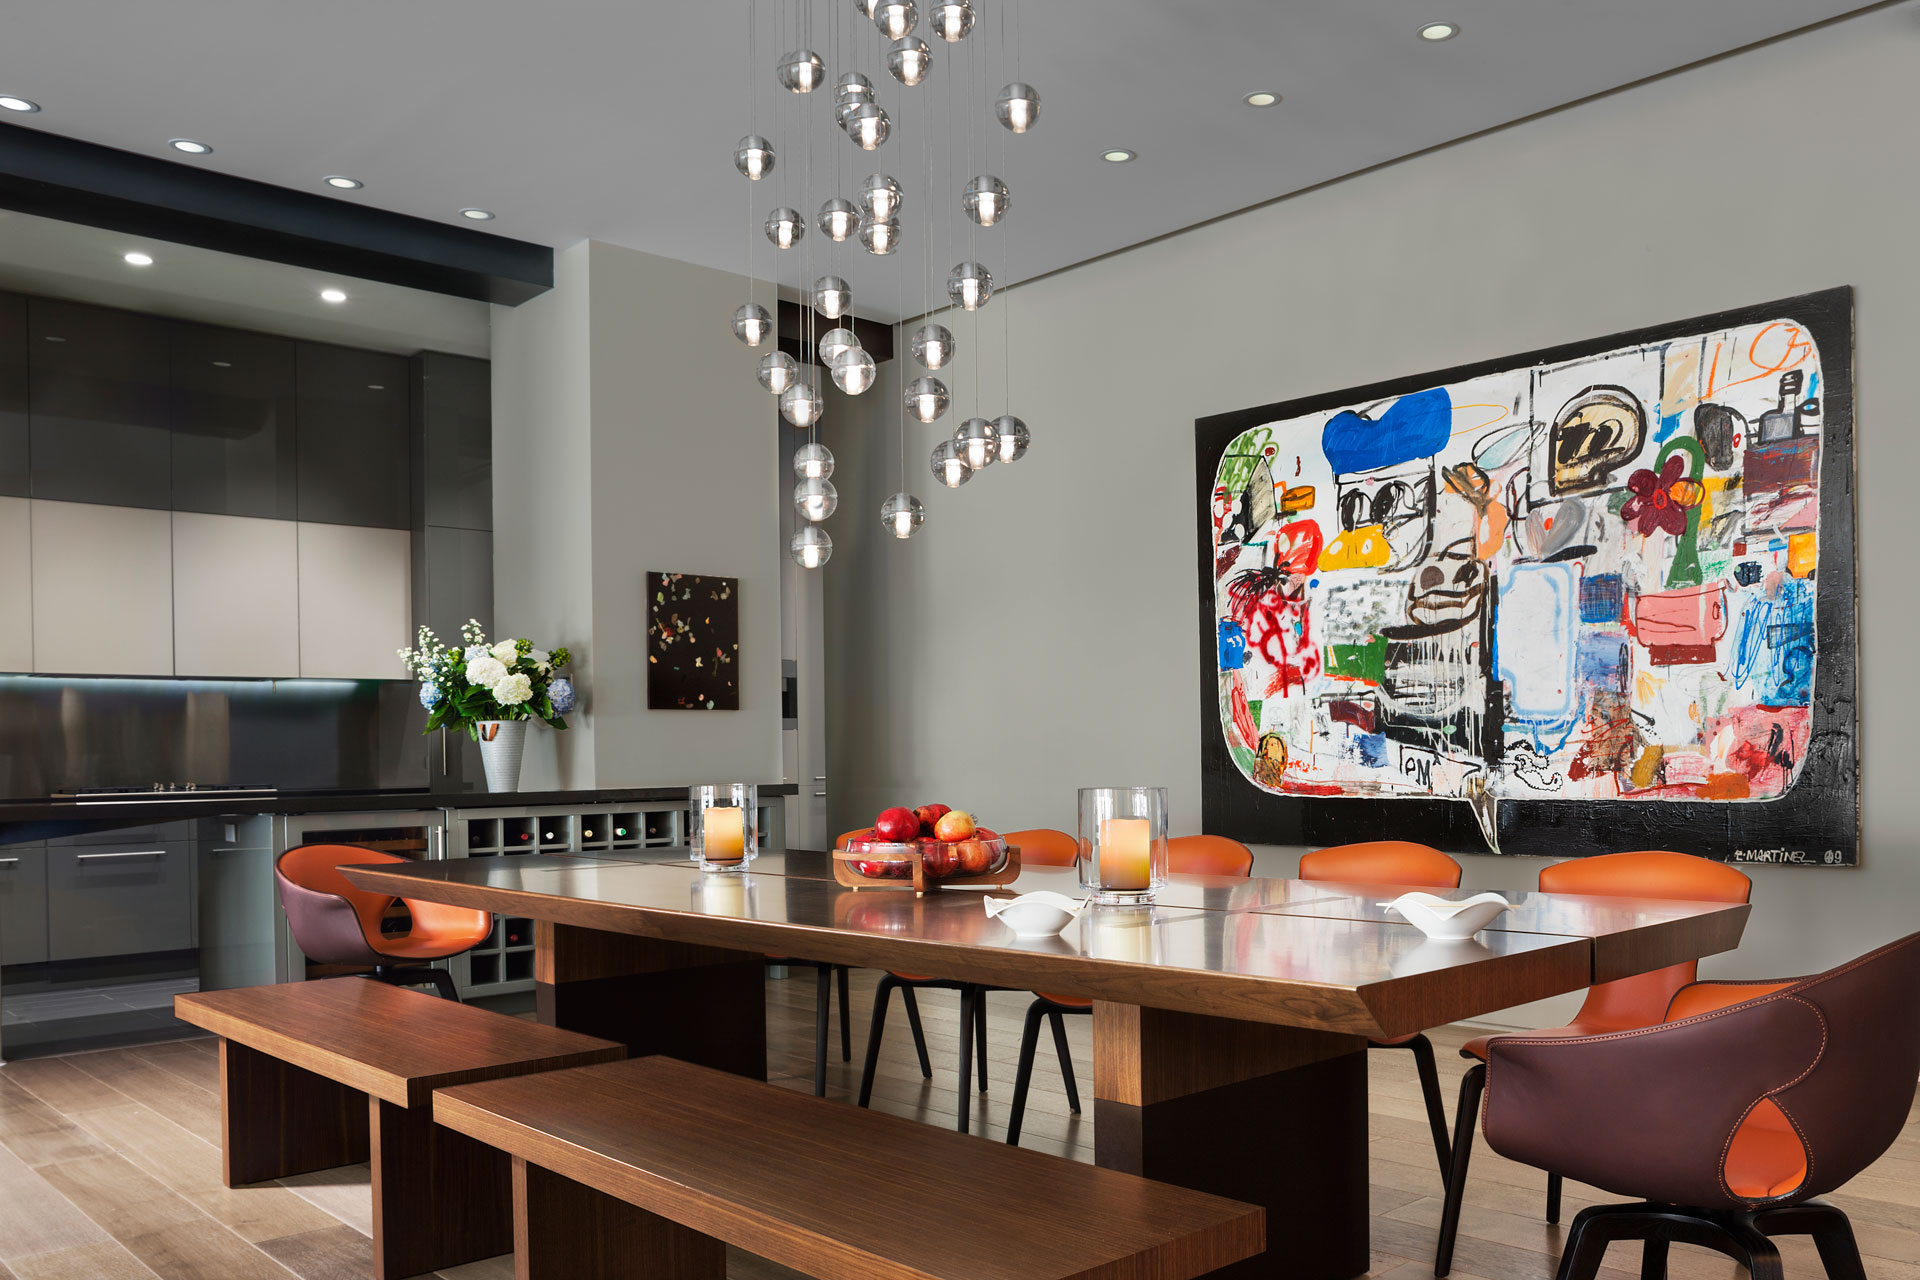 Bond Street loft | dining area by Axis Mundi